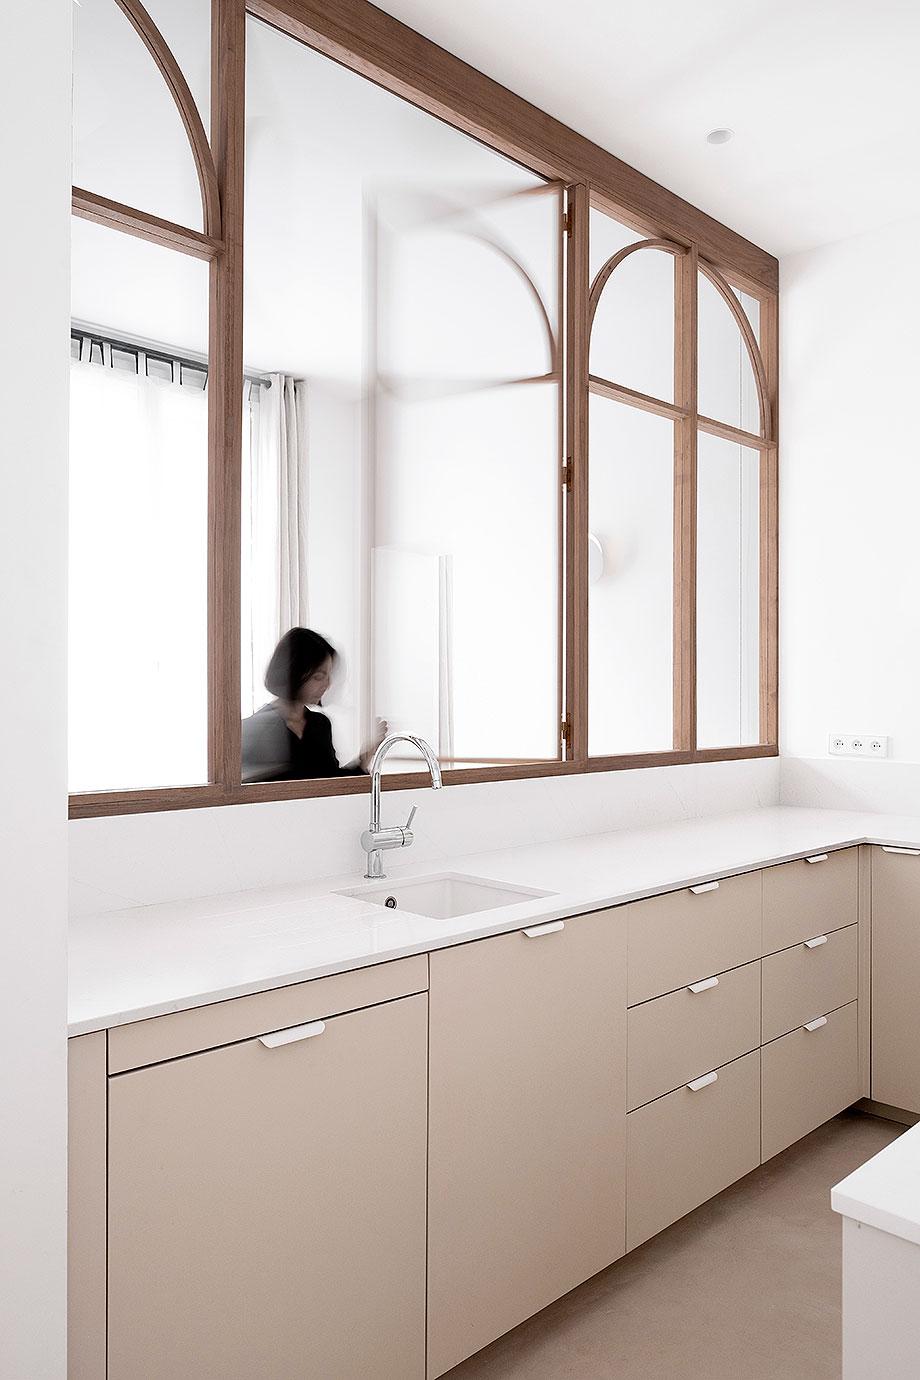 reforma integral de un apartamento en paris por anthropie architecture (s) (4) - foto juliette alexandre